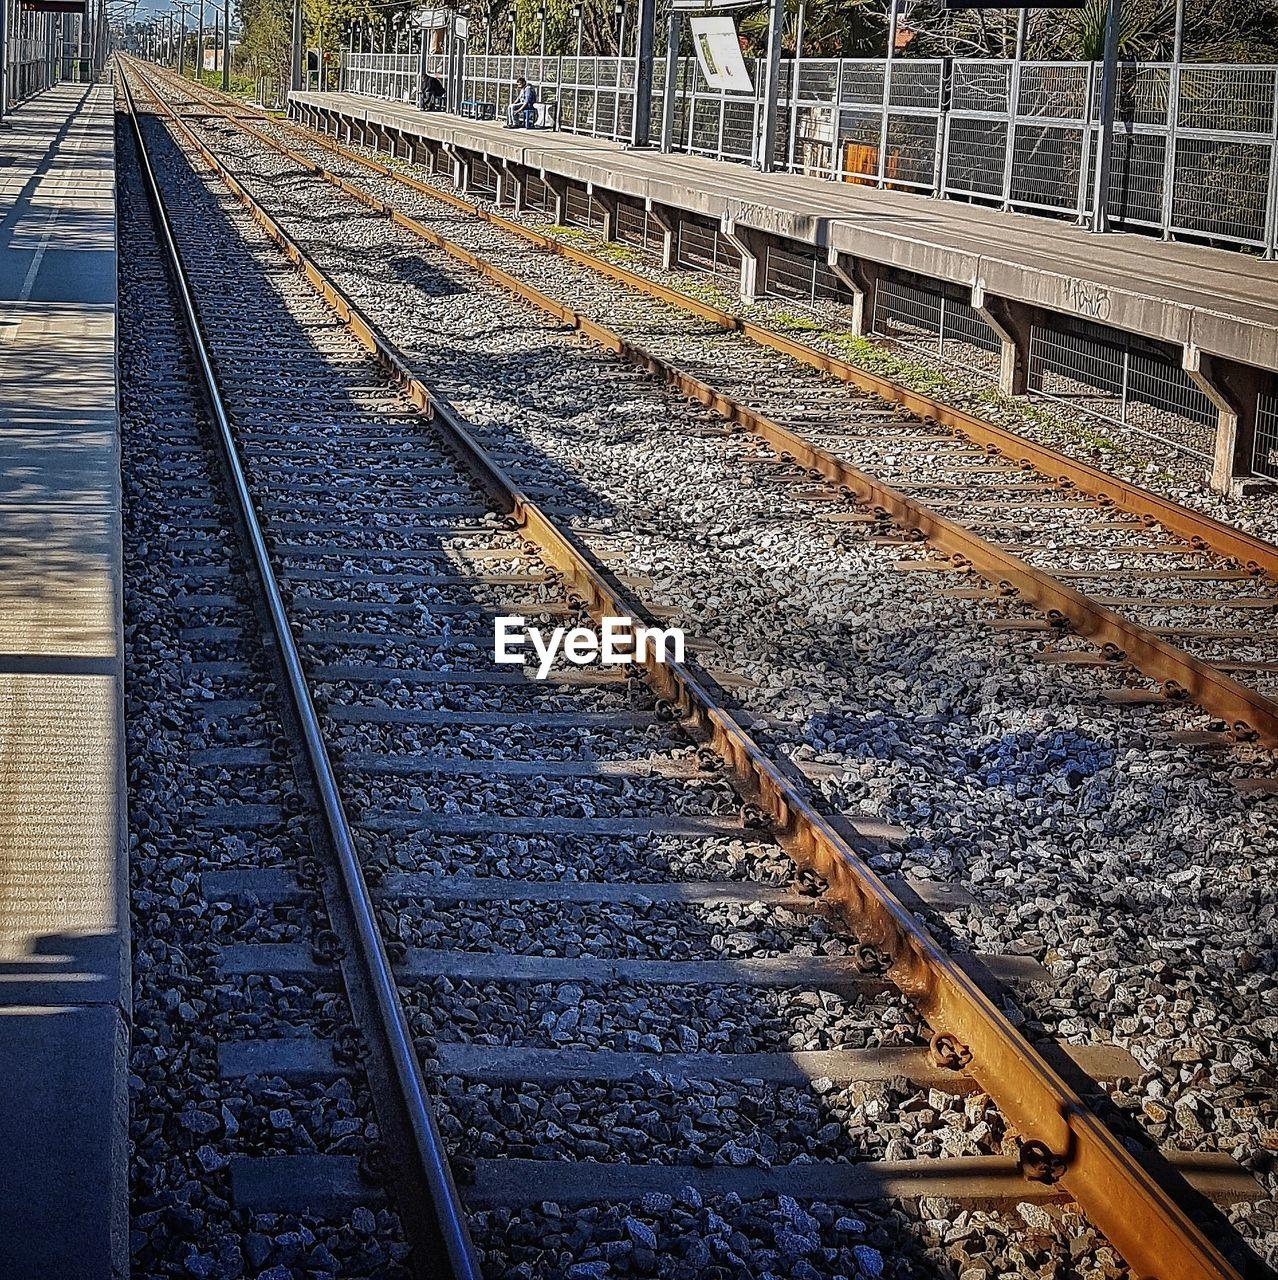 railroad track, rail transportation, transportation, railroad tie, public transportation, day, outdoors, railway track, railroad station, railroad station platform, railroad, train - vehicle, no people, nature